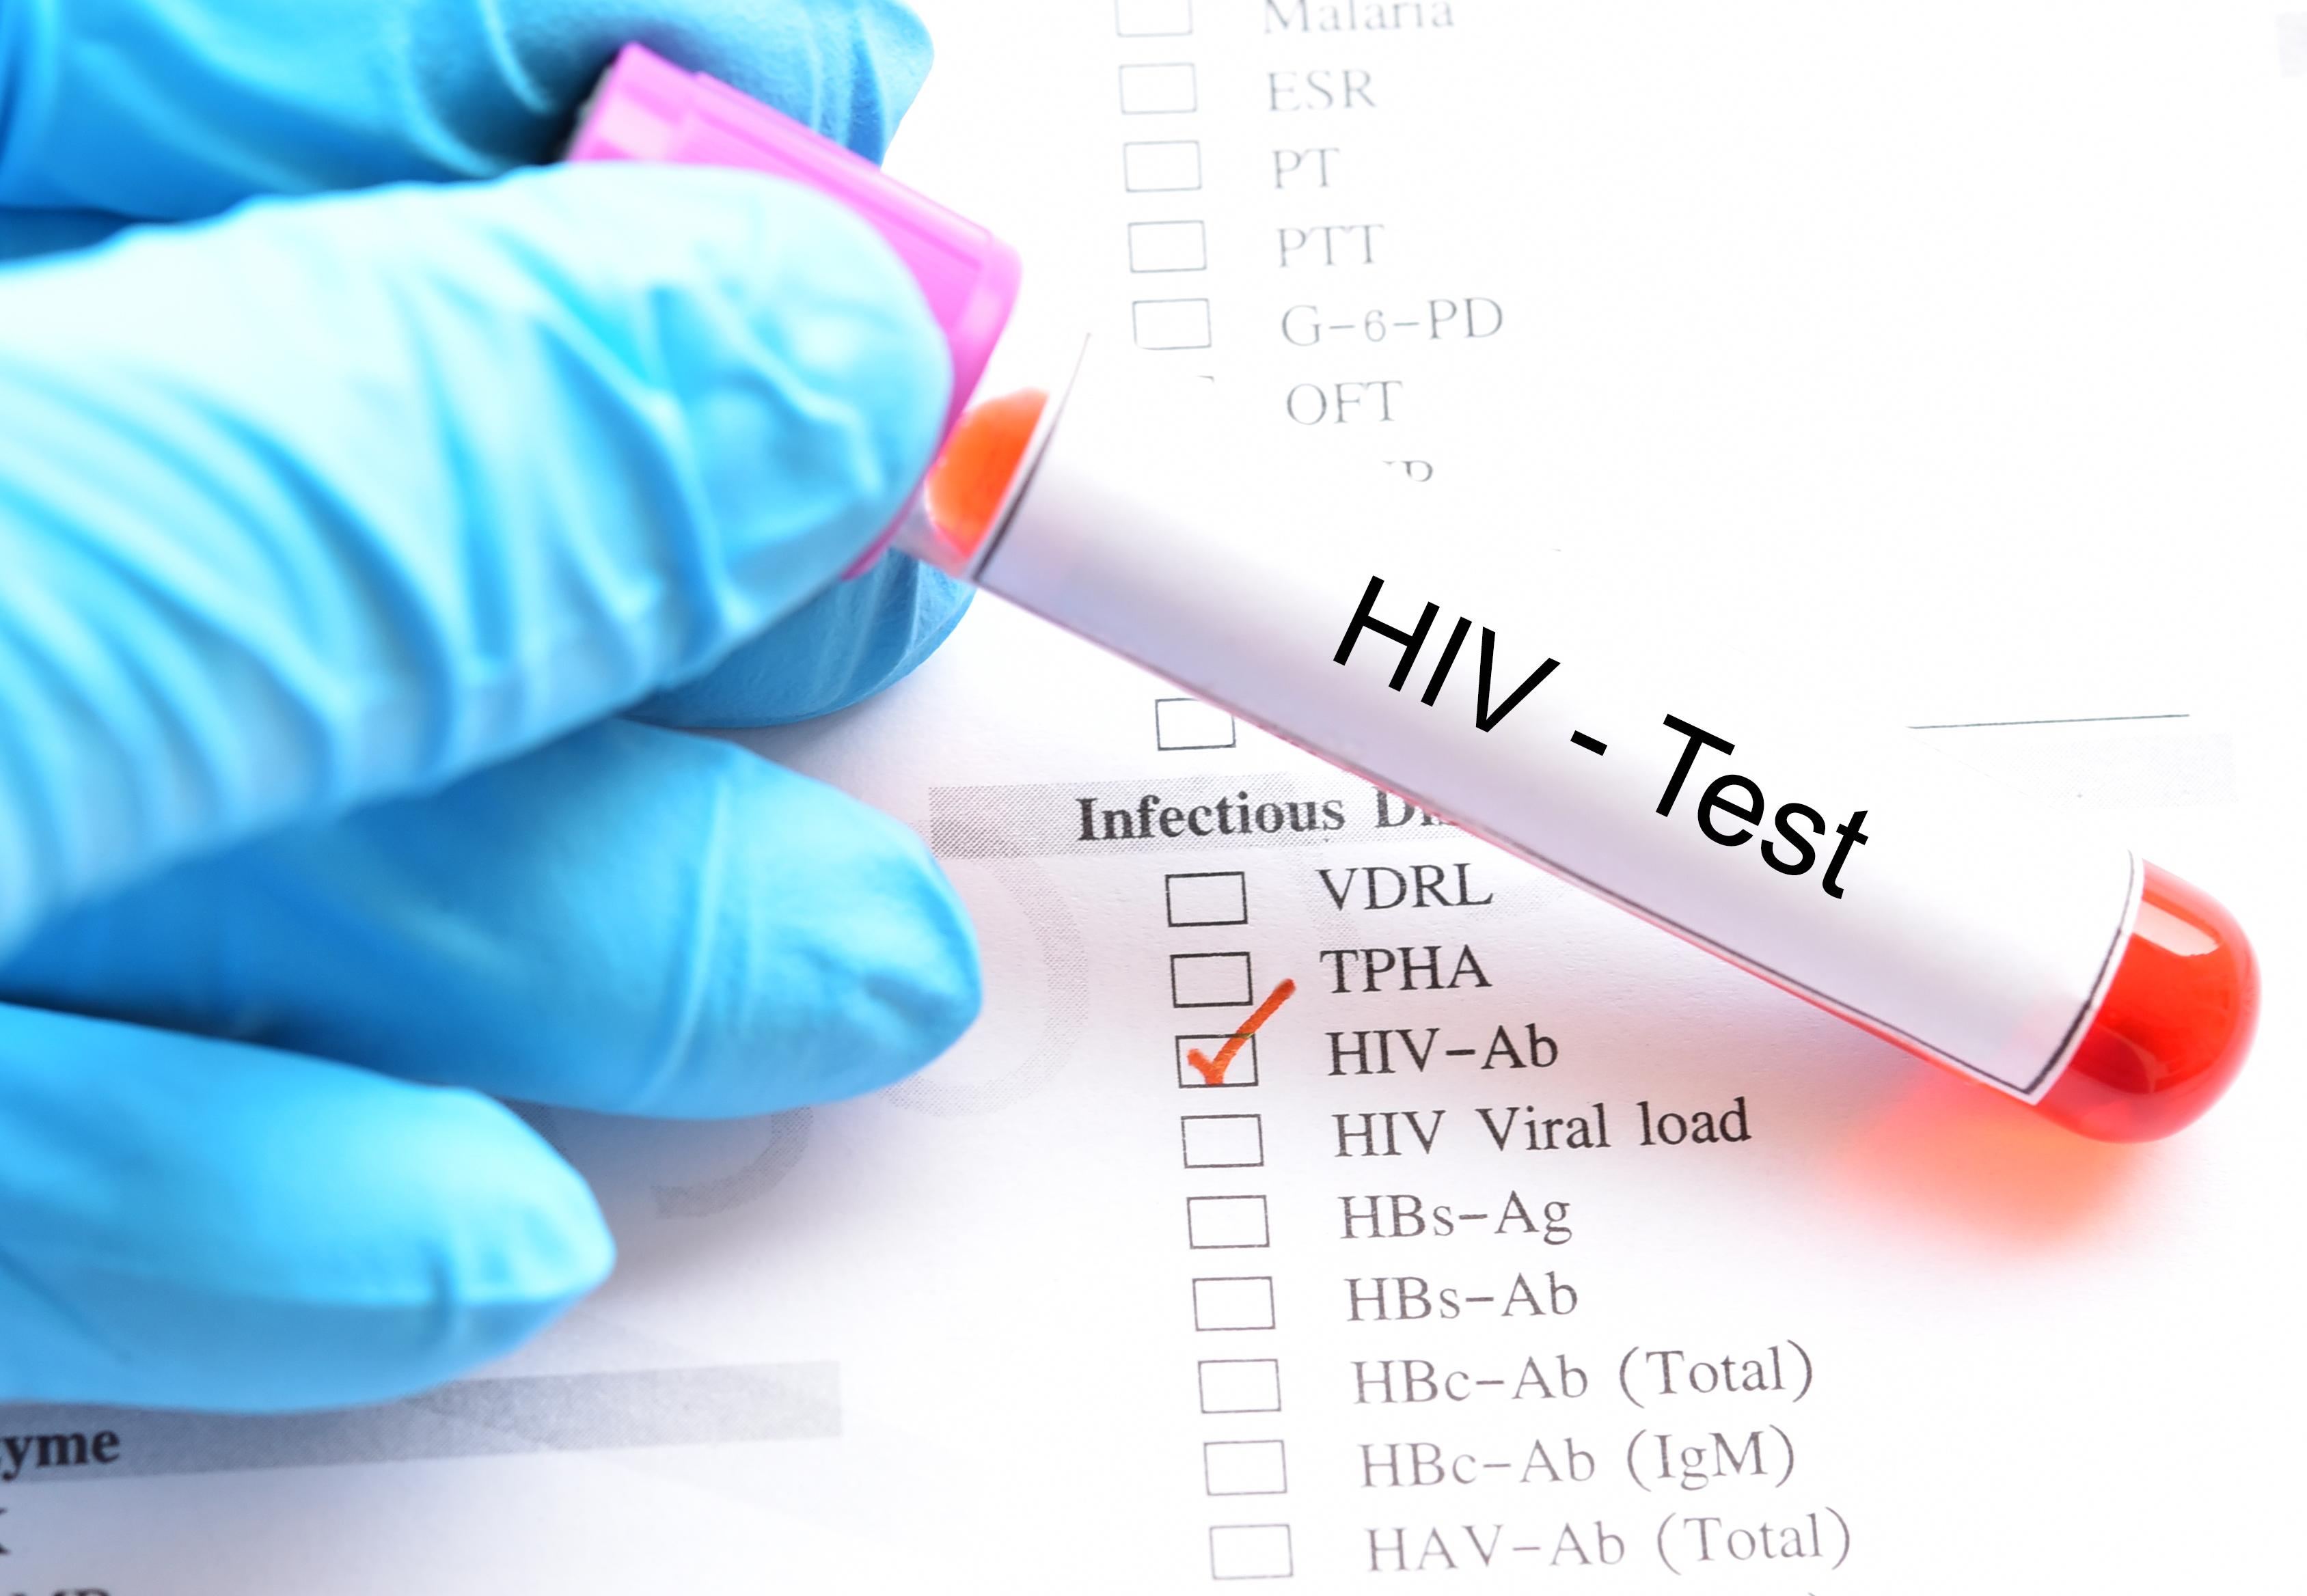 Blood sample for HIV test